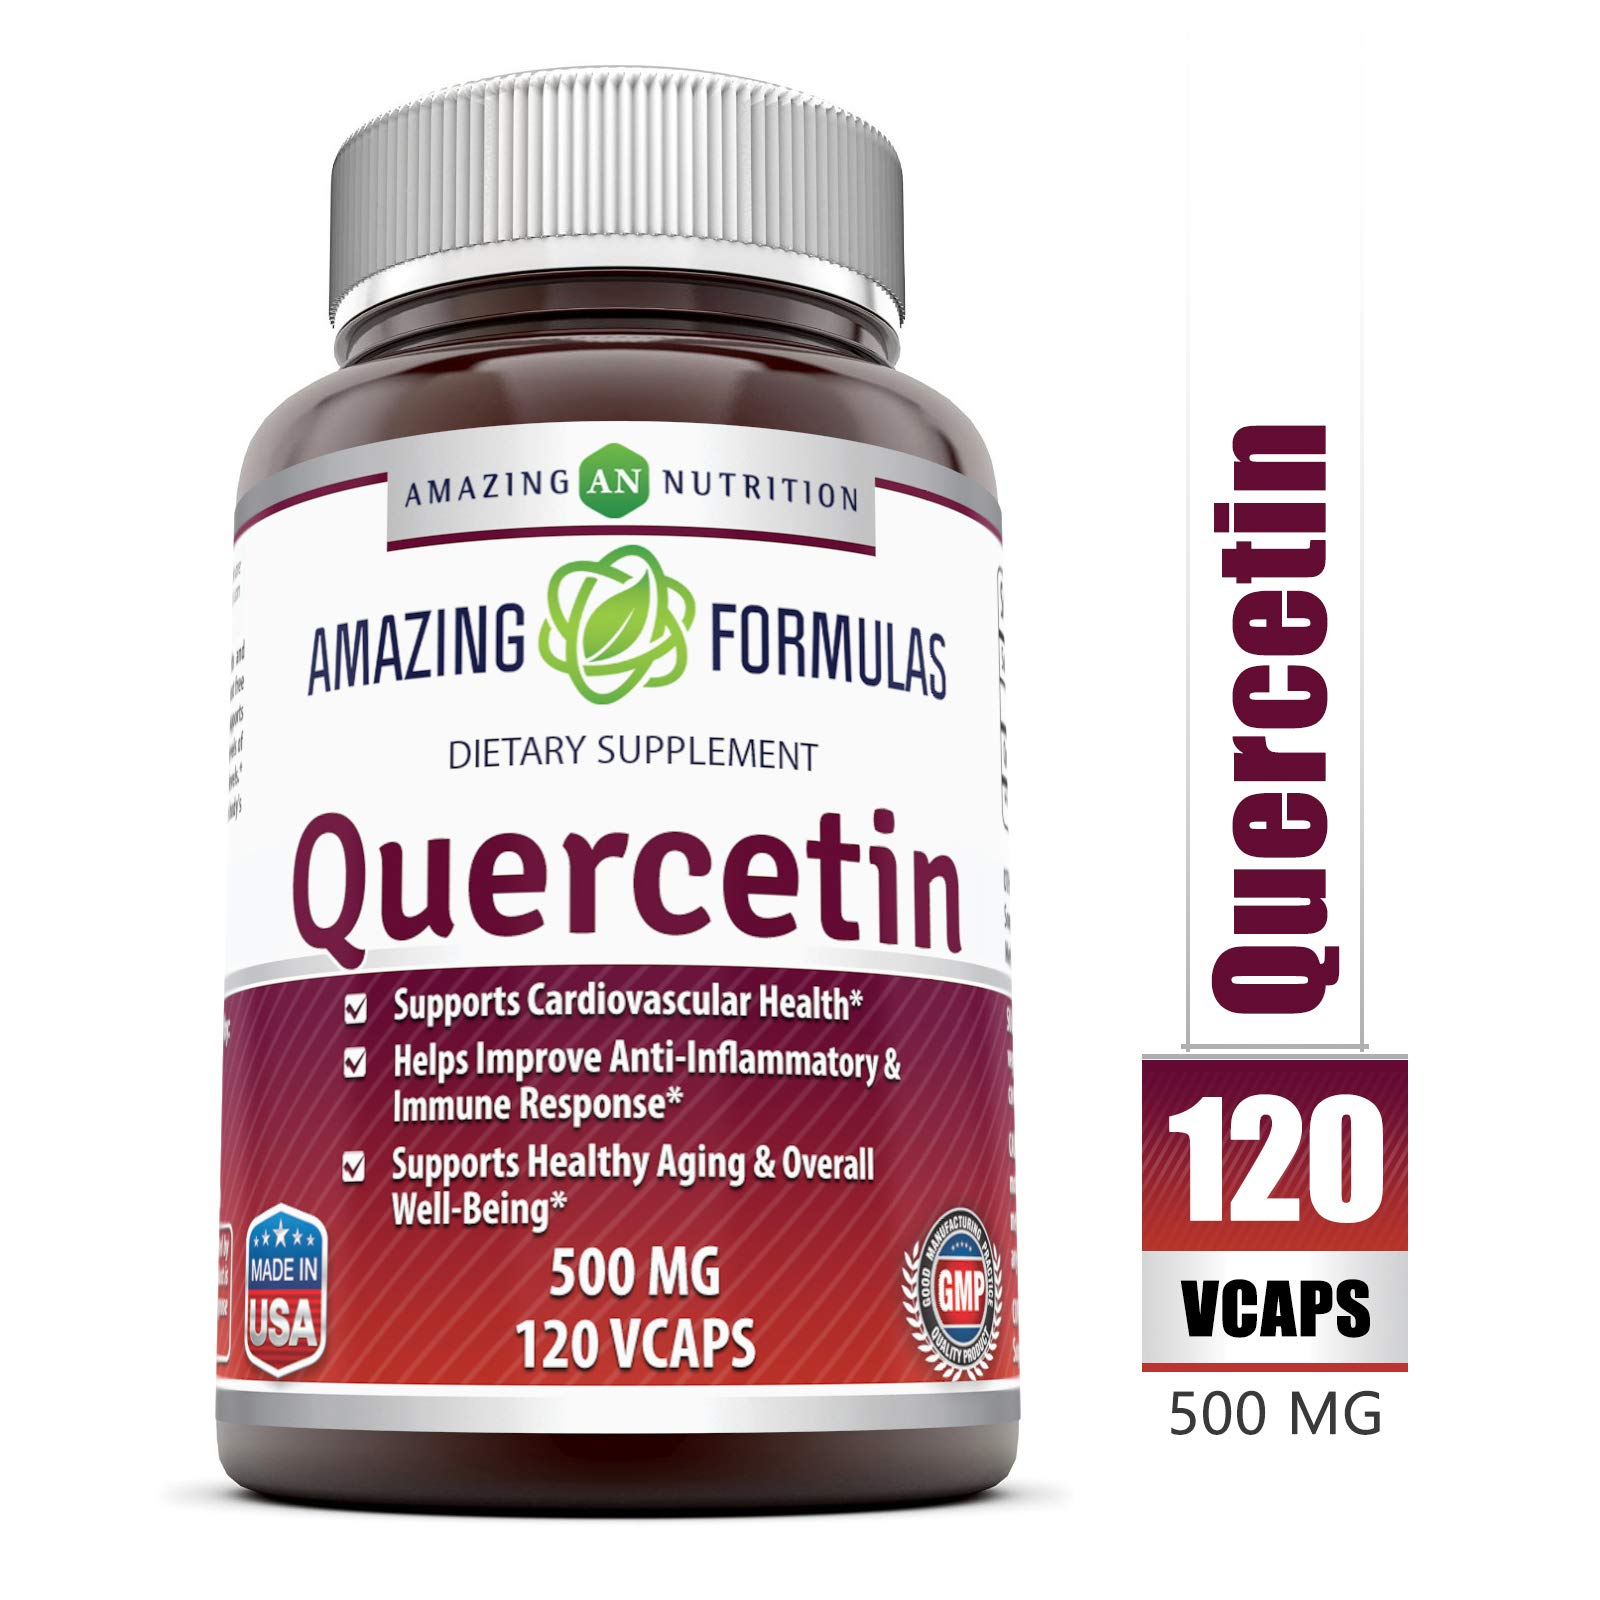 Amazing Formulas - Quercetin 500 Mg, 120 VCaps(Vegetarian Capsules) * Supports Cardiovascular Health, Helps Improve Anti-Inflammatory & Immune Response,